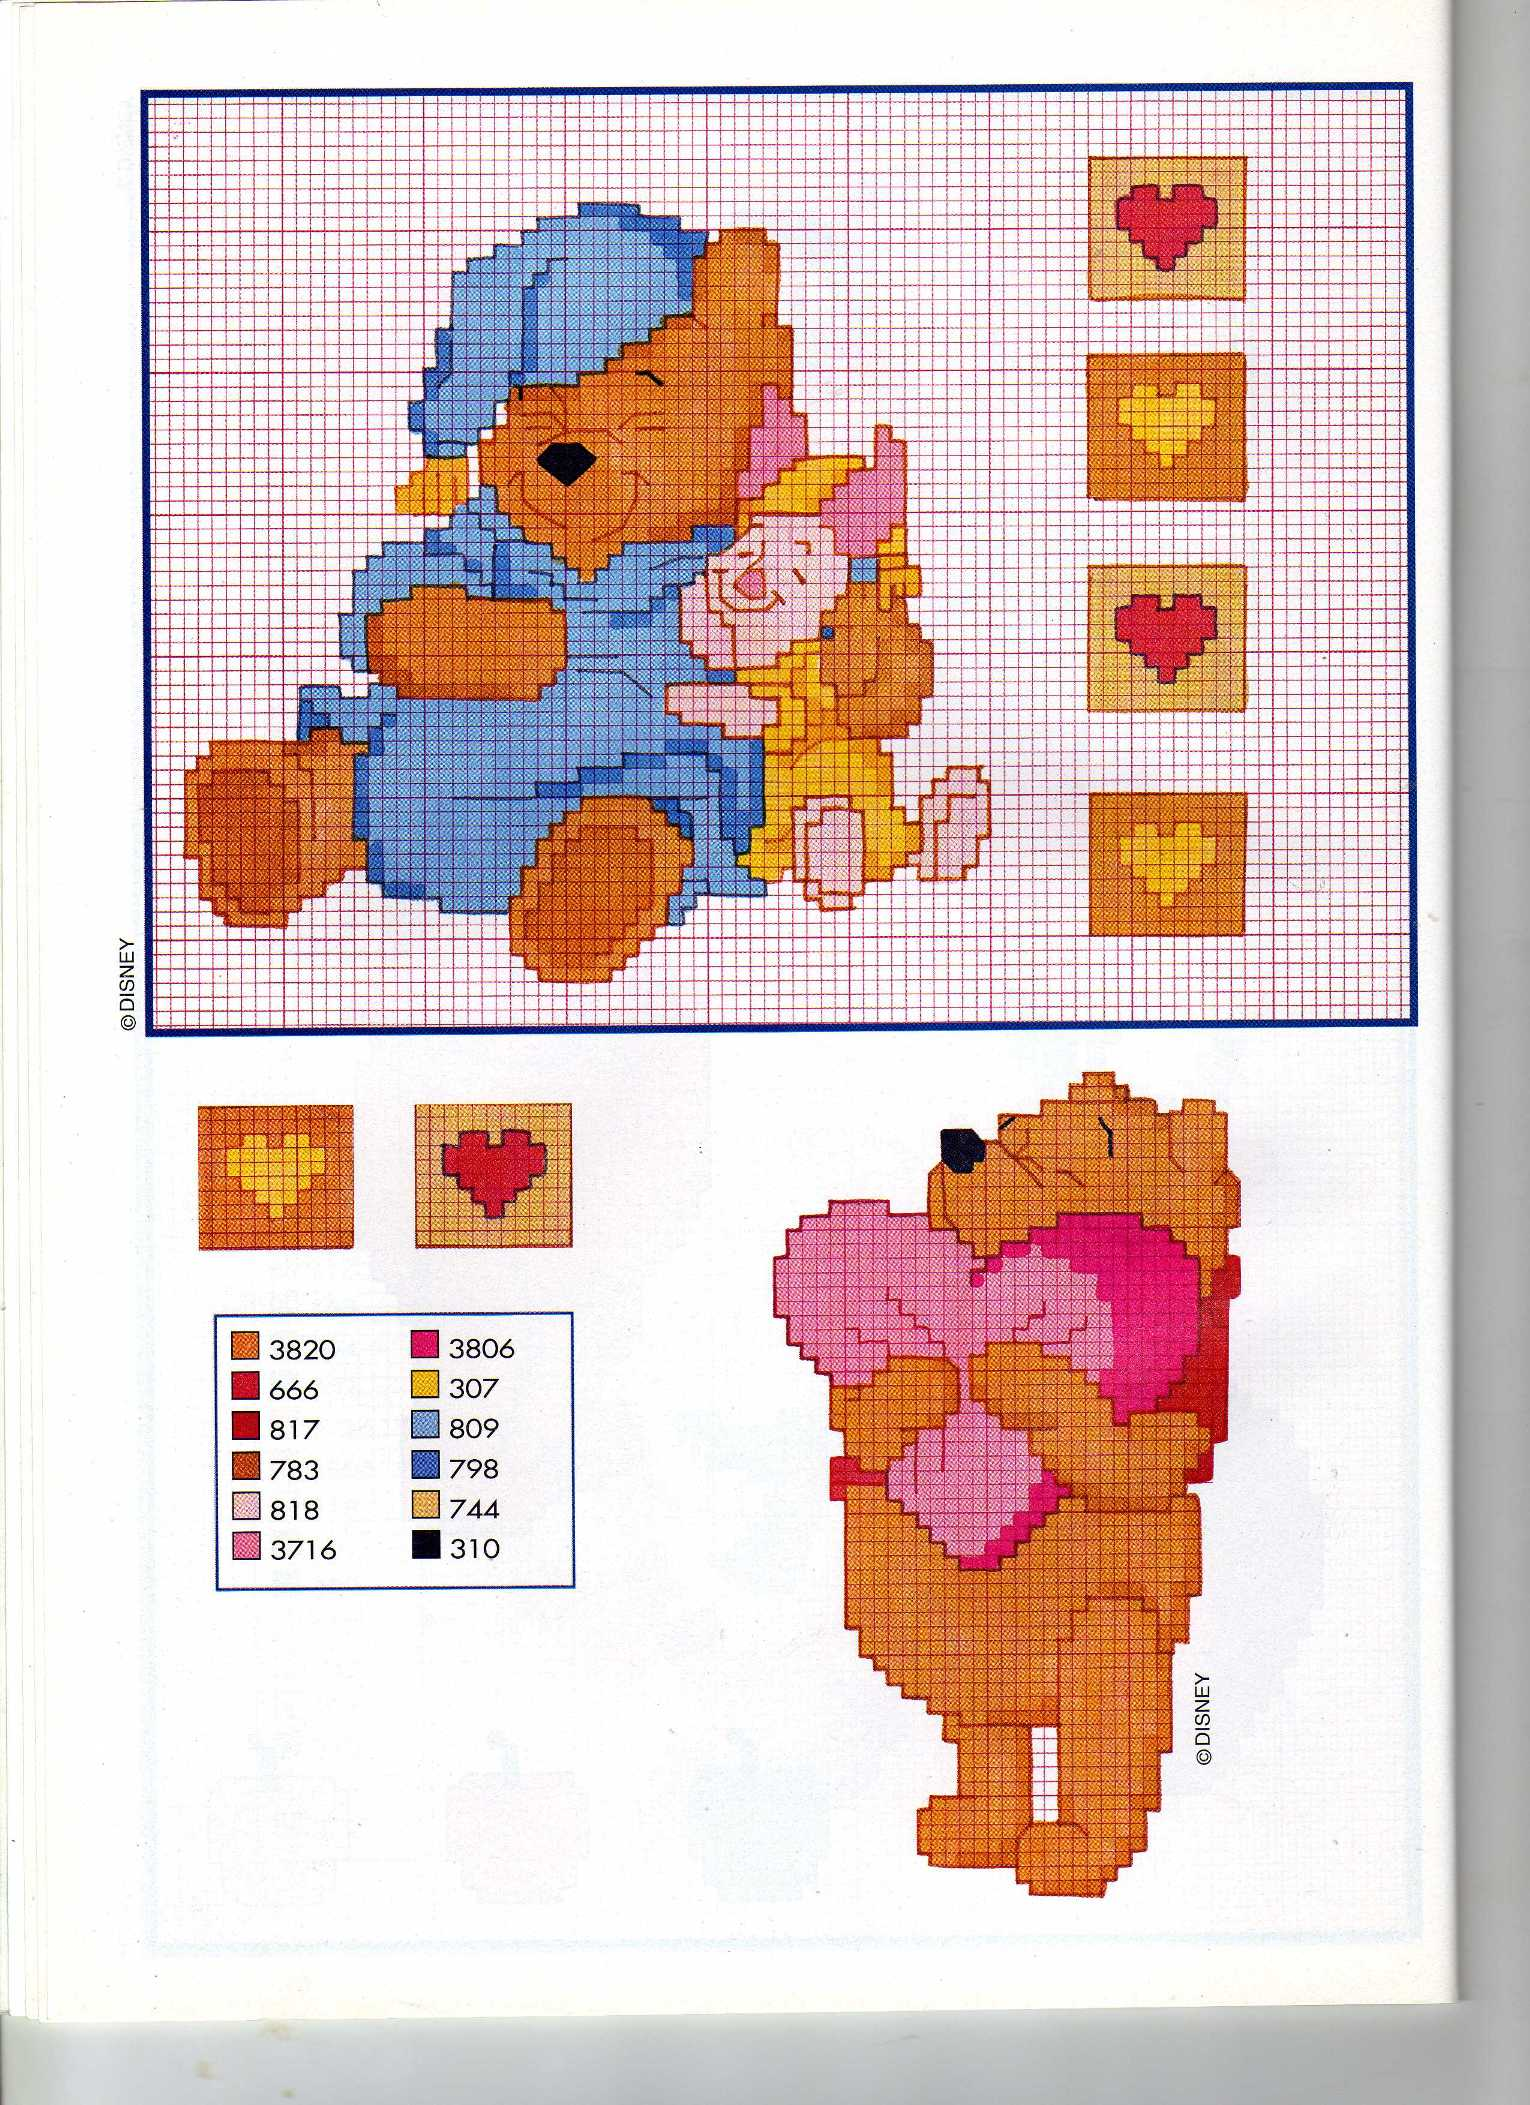 Winnie the pooh e pimpi nanna cuore punto for Punto croce disney winnie the pooh